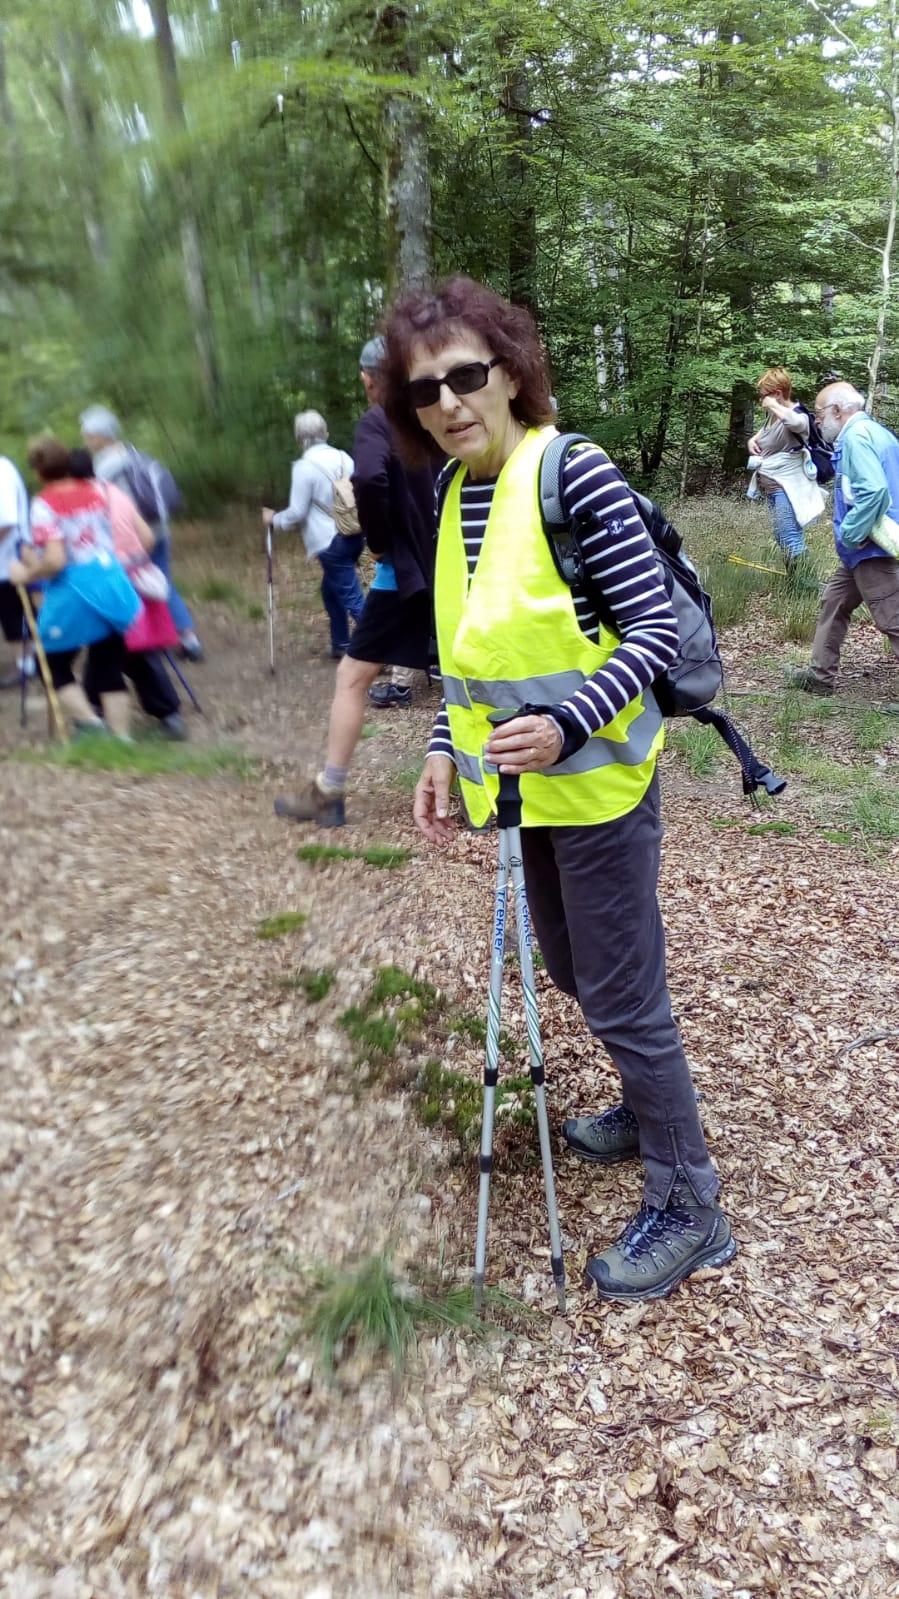 Plateau - Marmagne le 18 Juin 2018 n°14